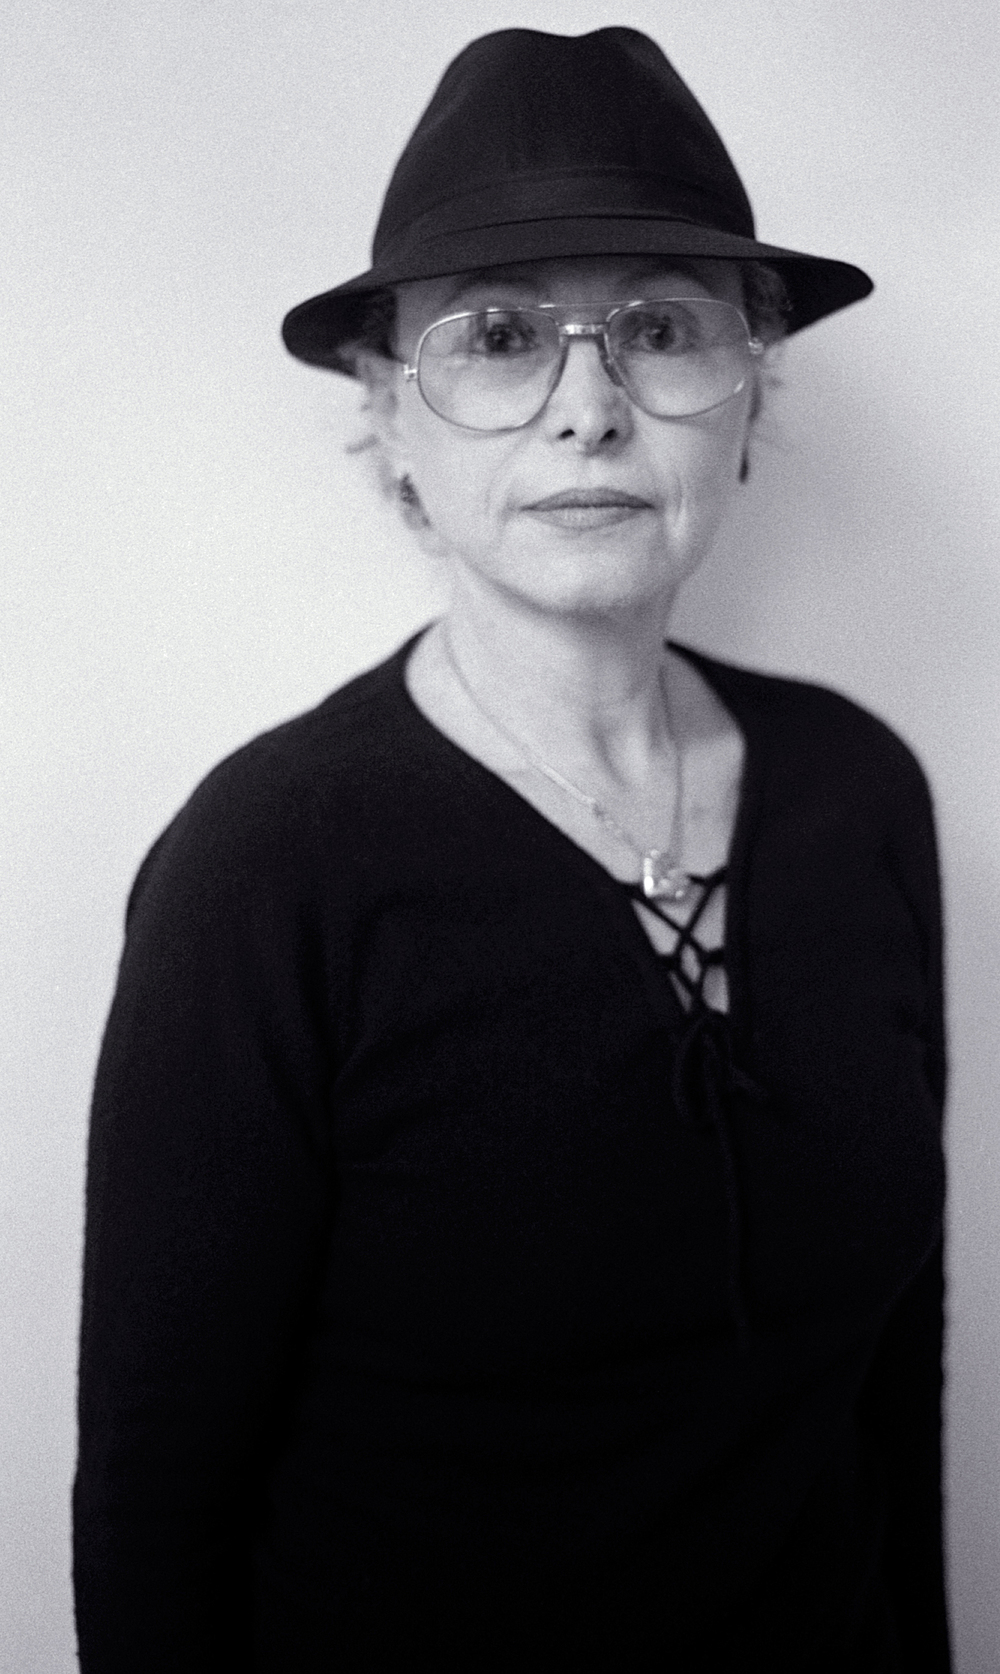 Elaine Berger